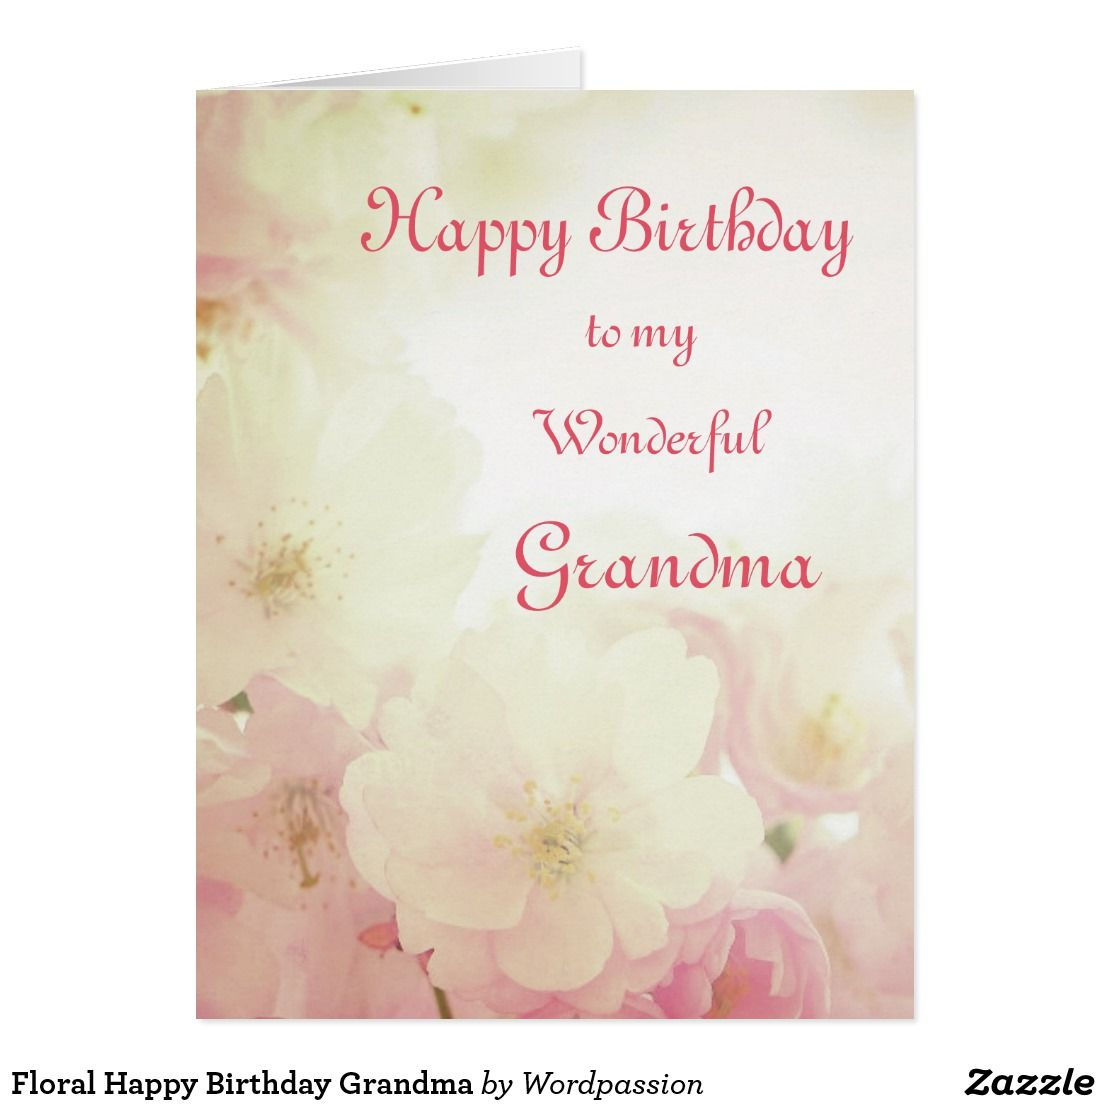 Floral Happy Birthday Grandma Card Zazzle Com Happy Birthday Grandma Happy Birthday Mom Mom Cards